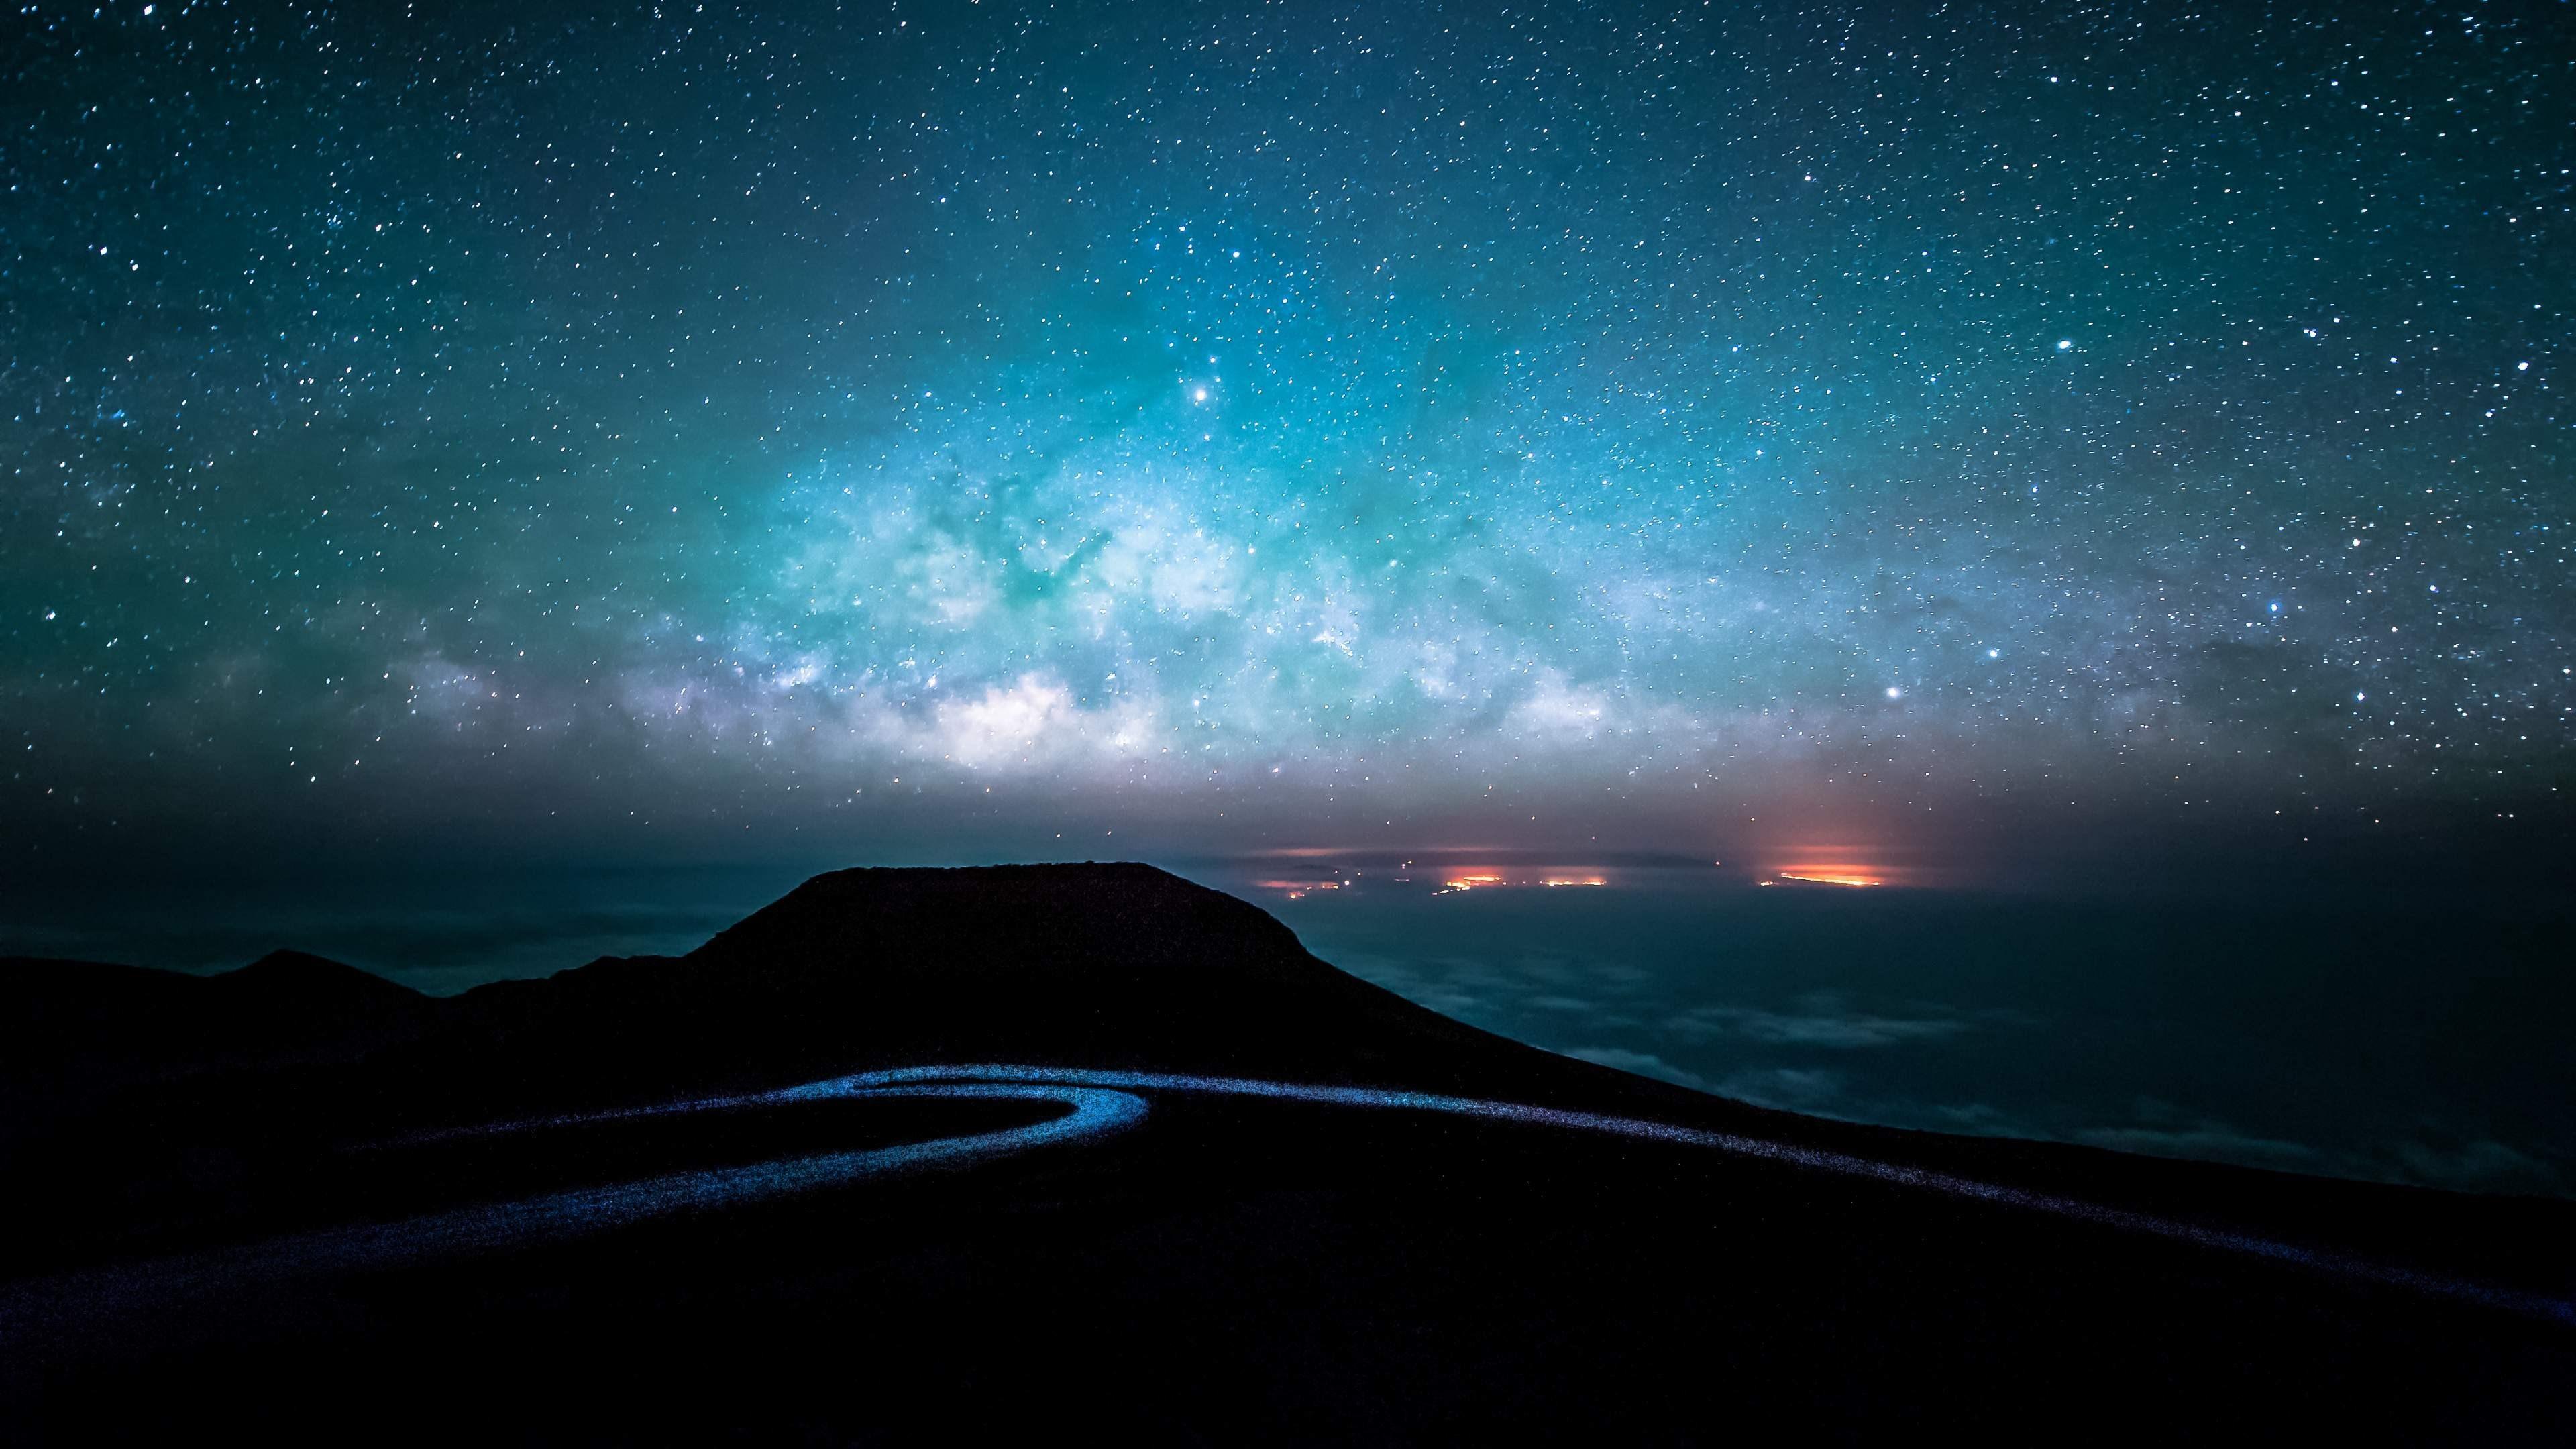 Night Sky 4k Wallpapers - Wallpaper Cave